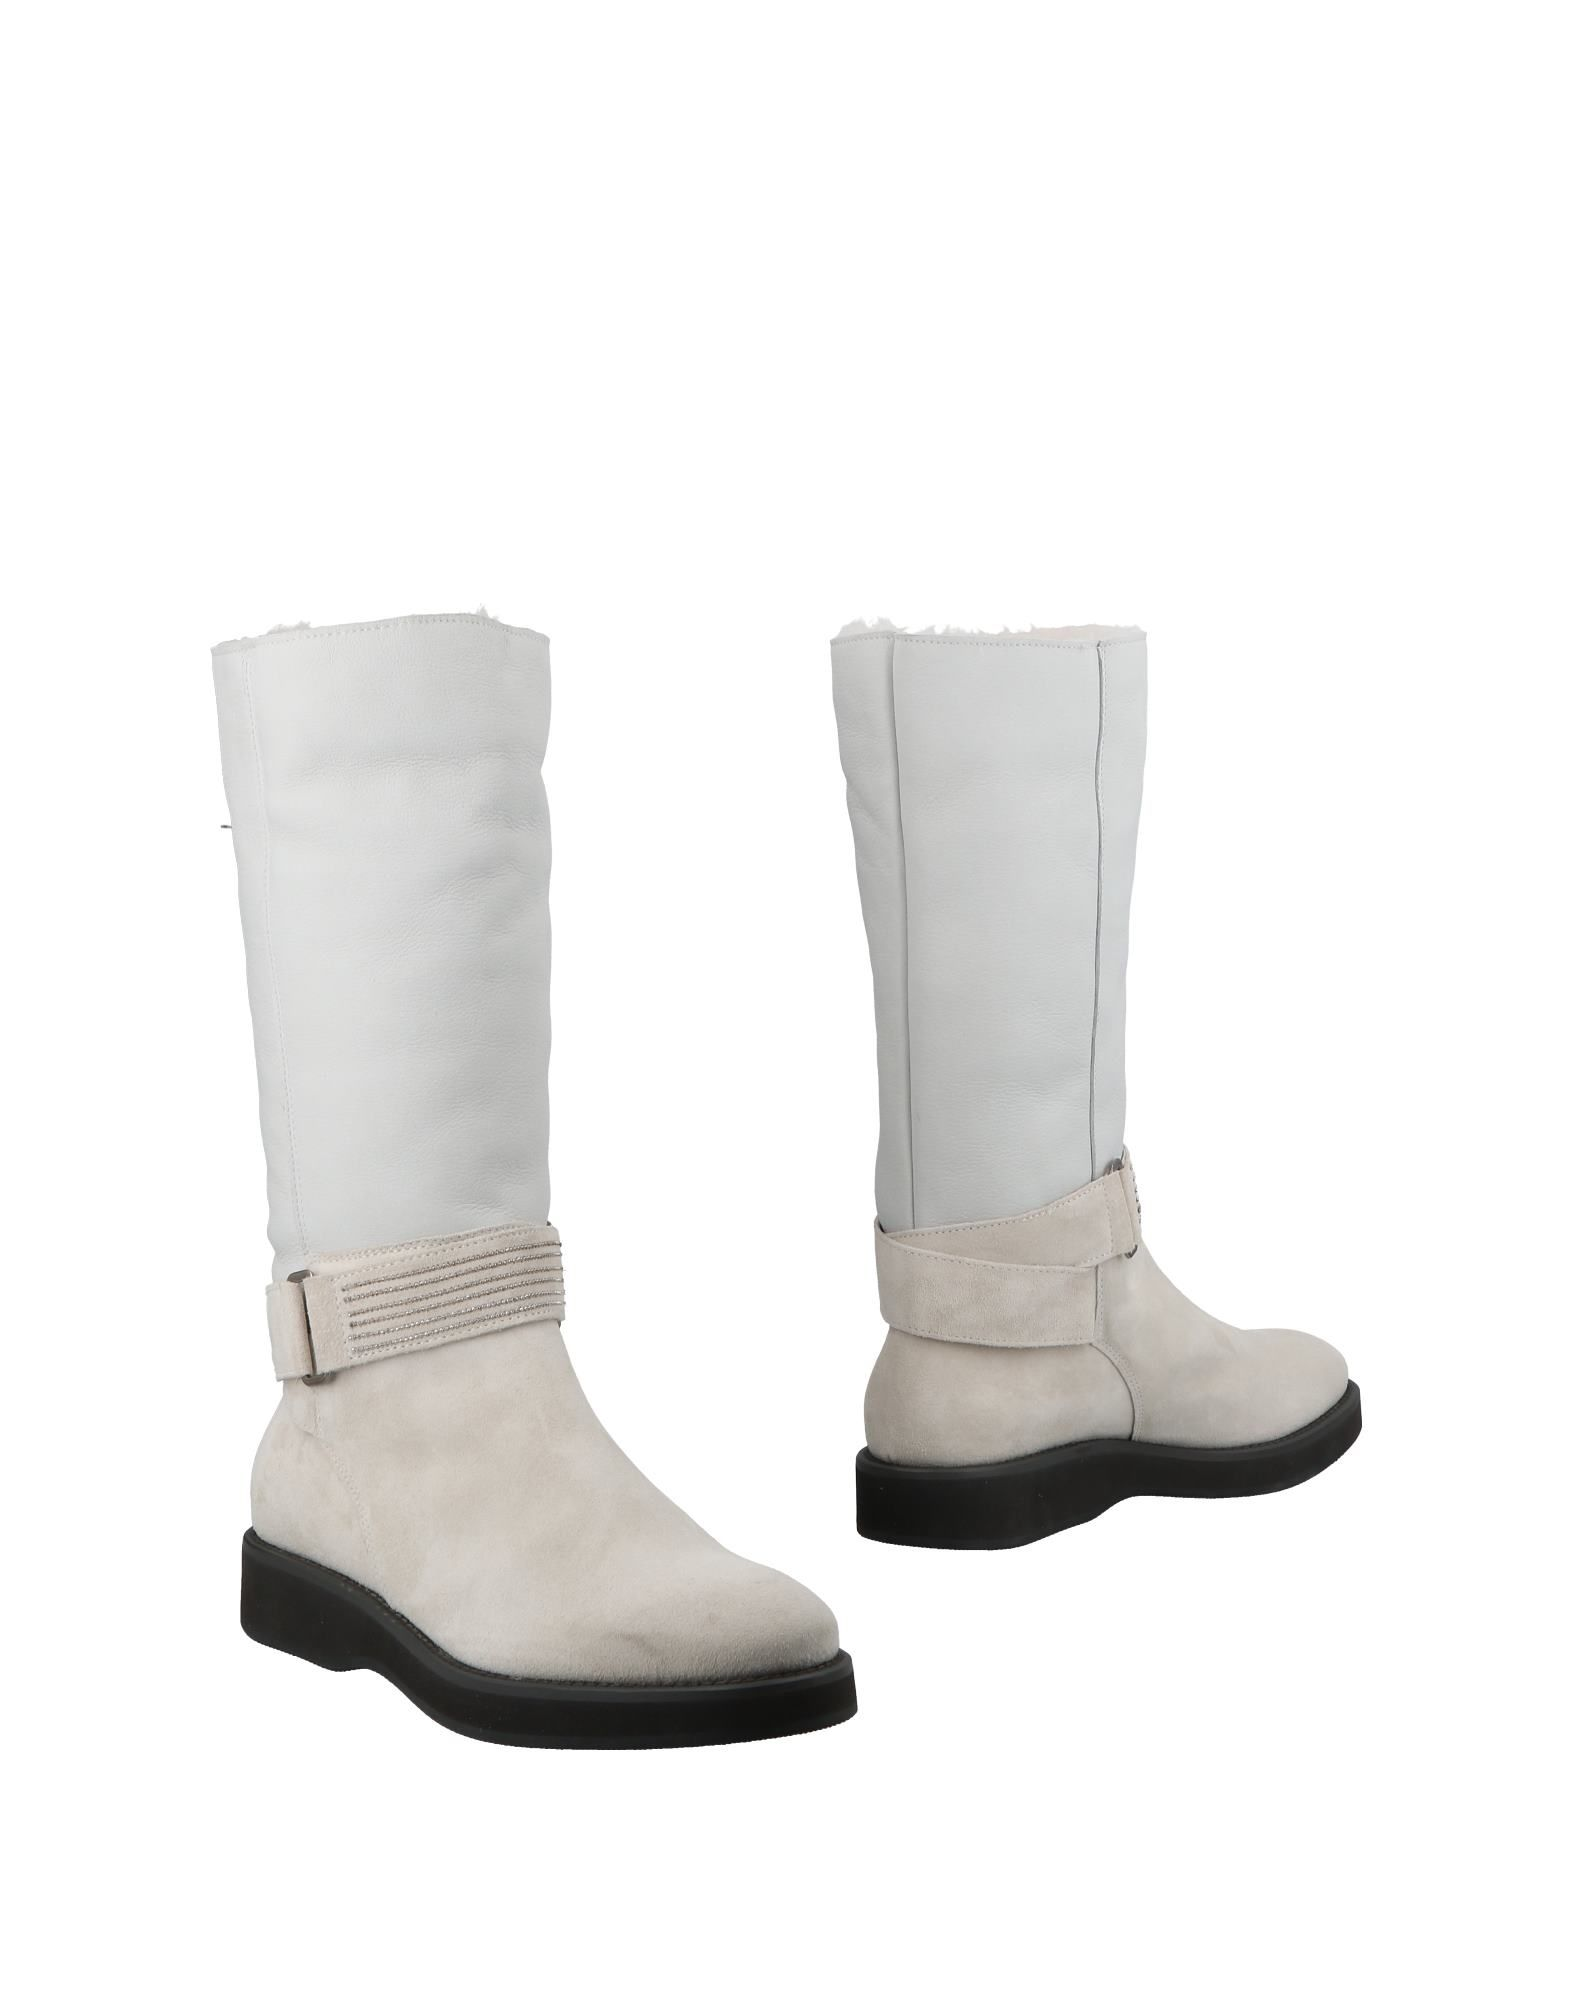 Fabiana Filippi Stiefel Damen  11504103DQ 11504103DQ  Neue Schuhe cc1dd1